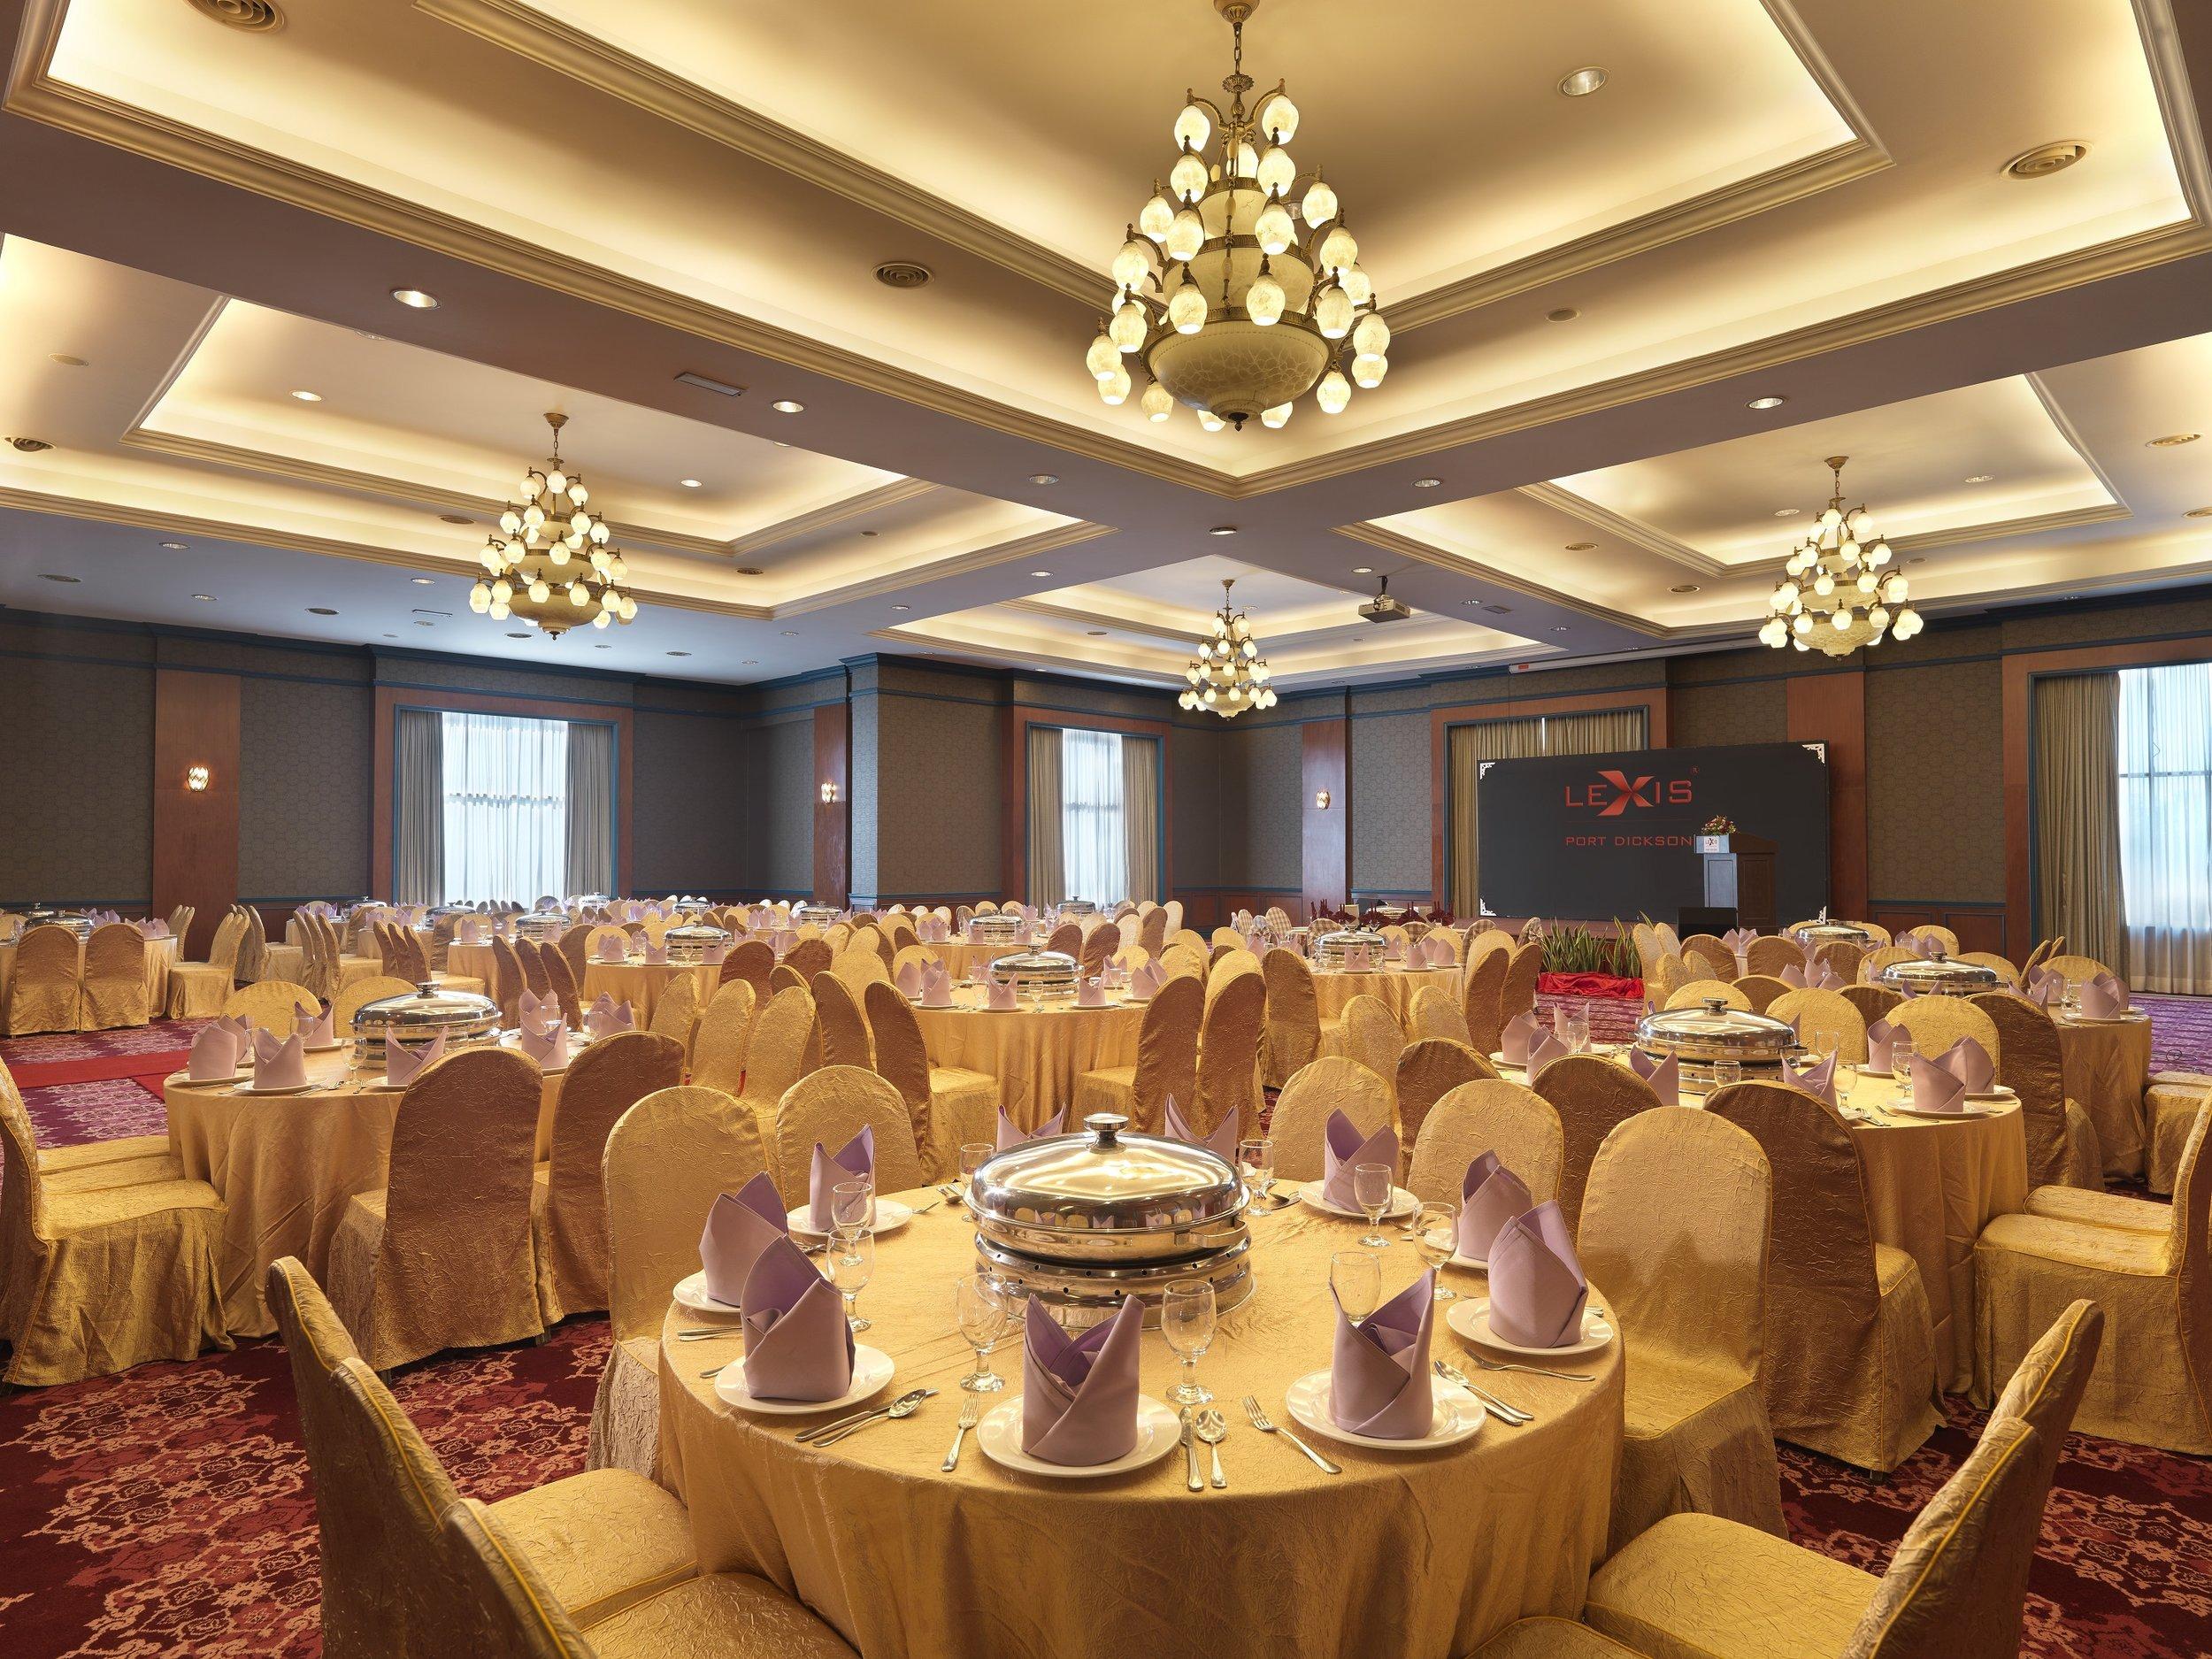 CE. Indoor Facilities - Ballroom - Round Table.jpg